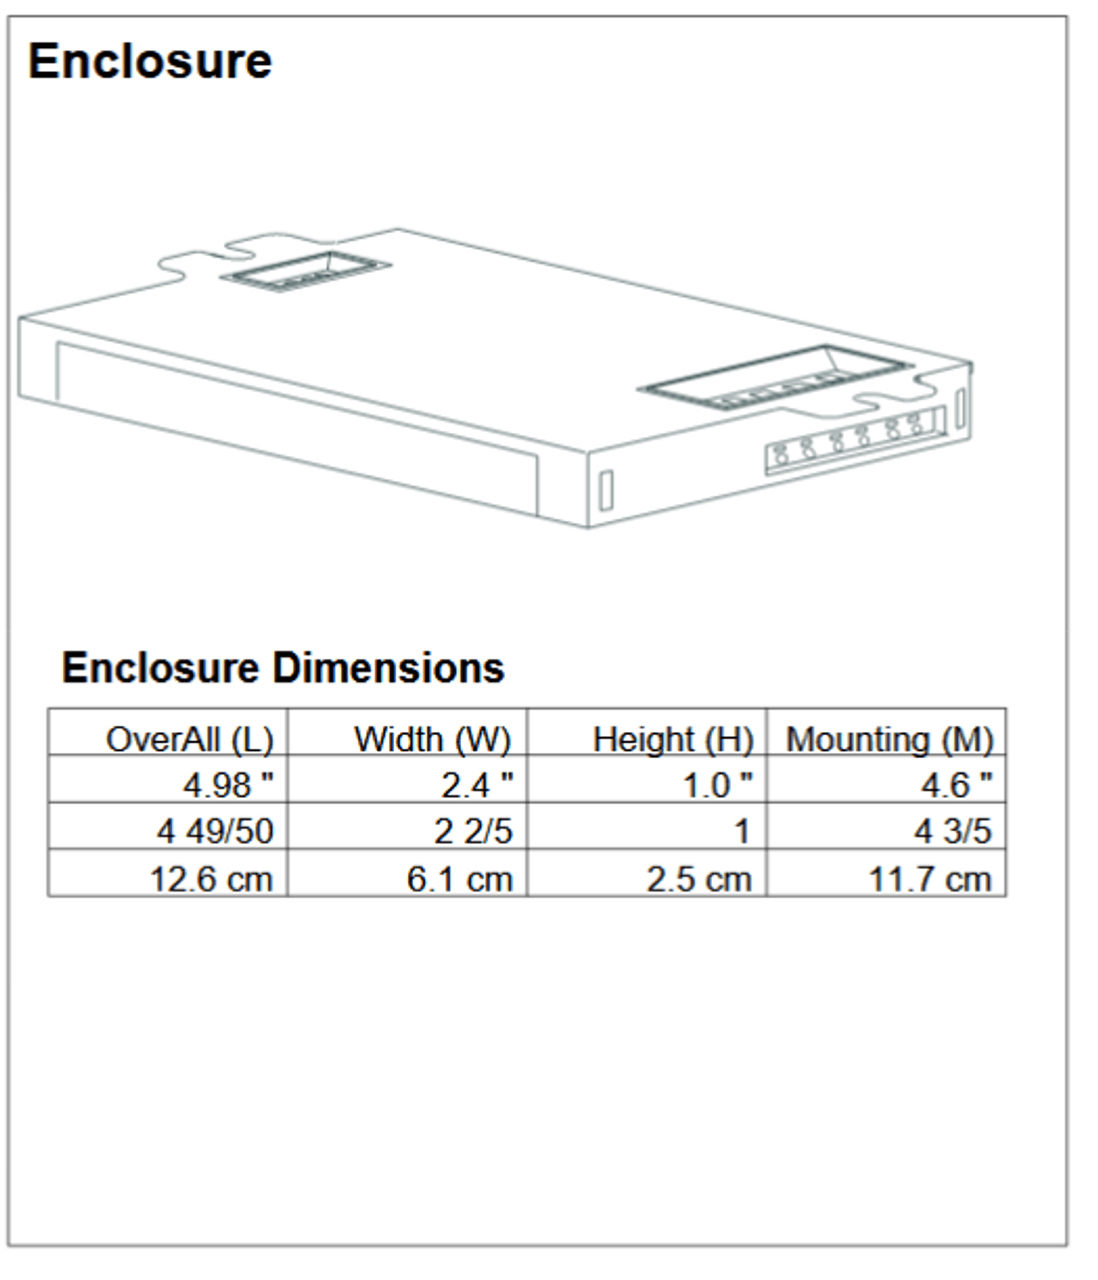 icf 2s13 h1 ld advance electronic cfl ballast phillips advanced electrical transformer diagrams [ 1098 x 1280 Pixel ]